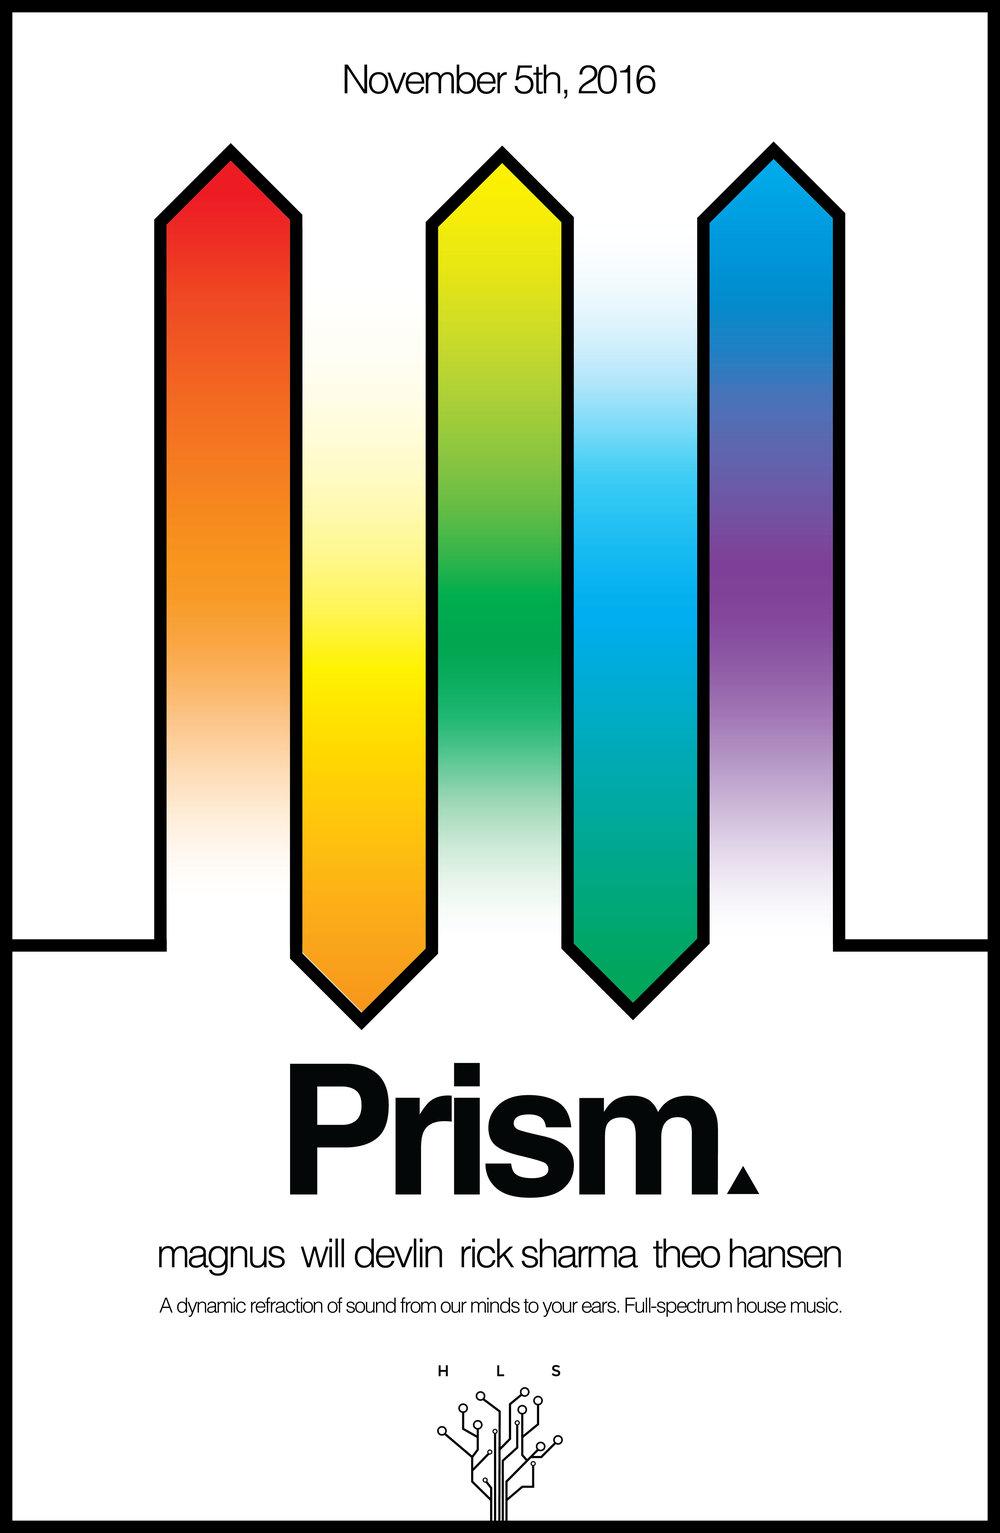 prism-habitat-november-5.jpeg